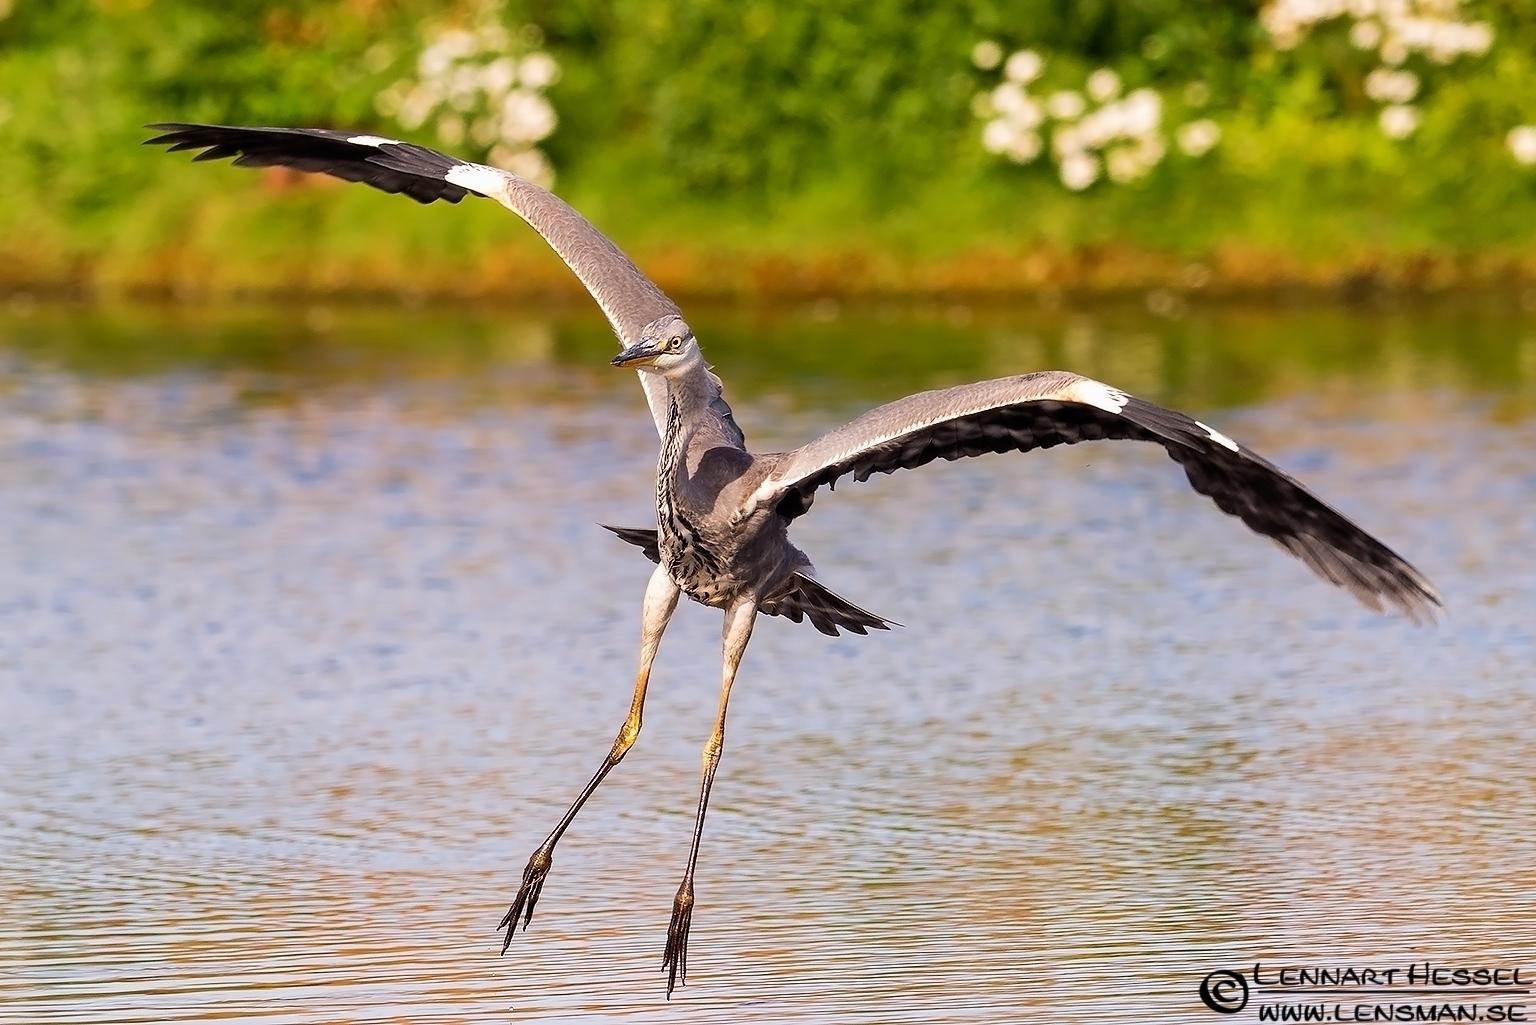 Grey Heron, Halland